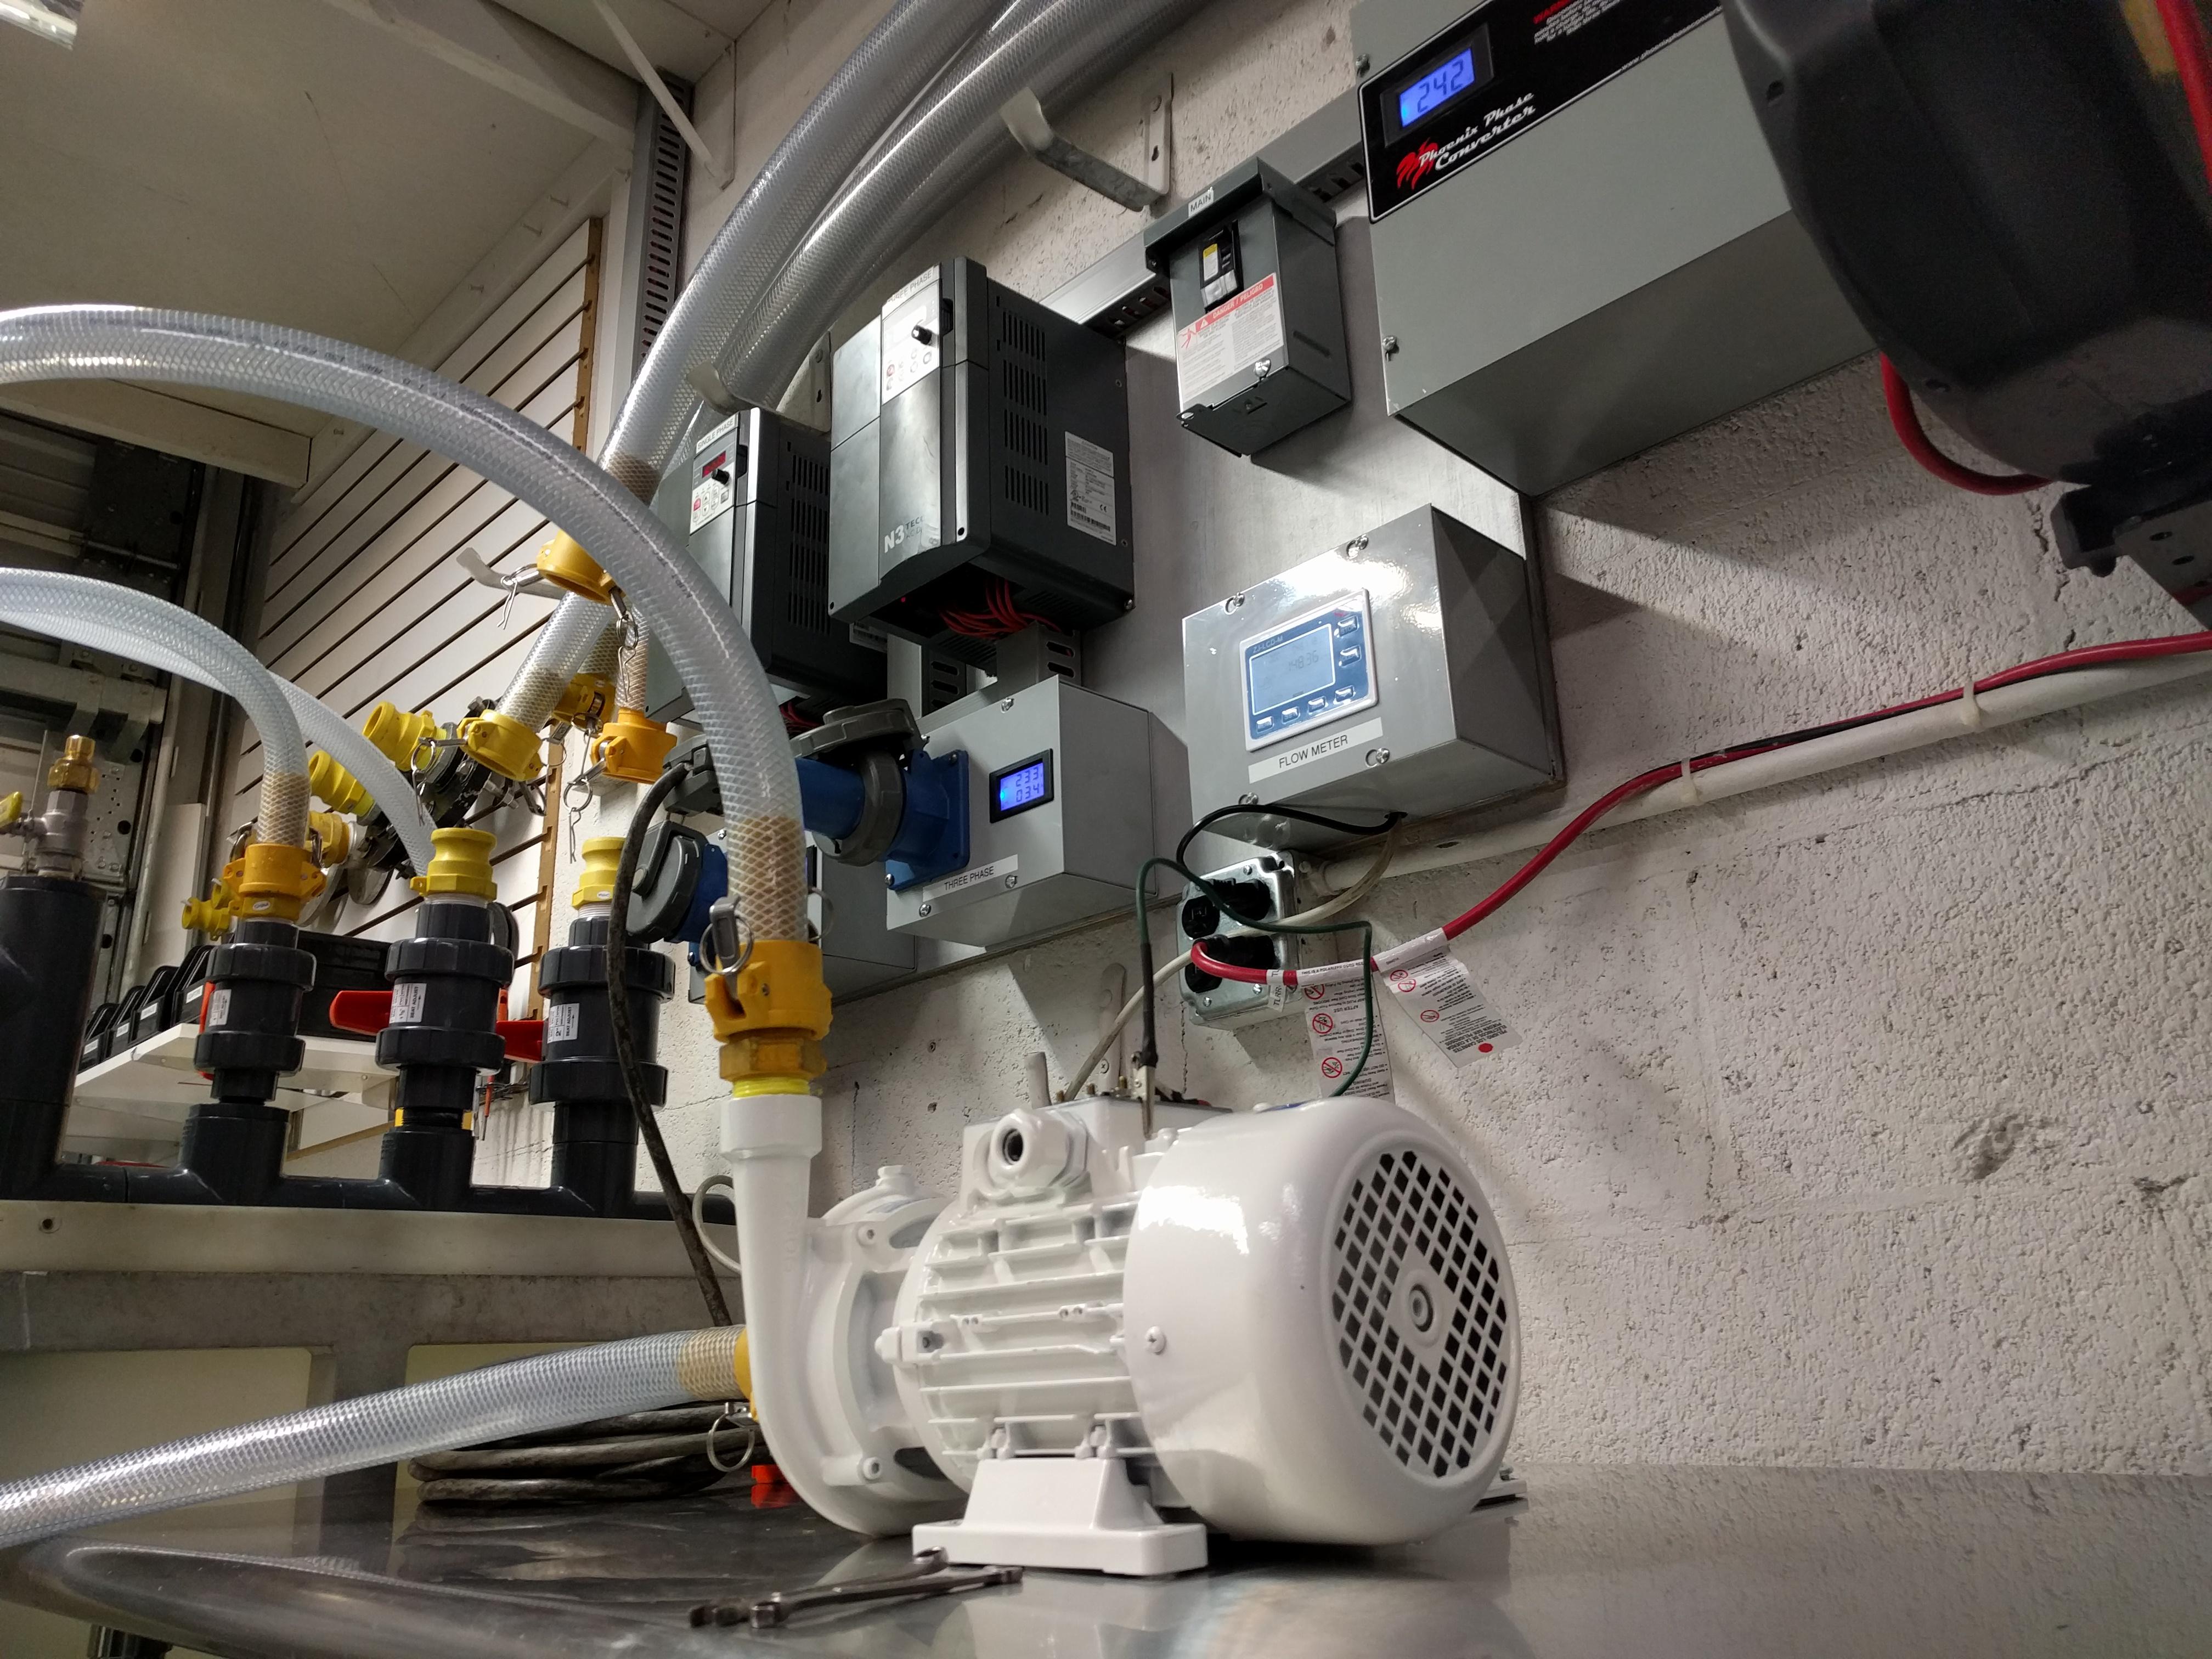 Onboard Gianneschi pump maintenance by Ingham Engineering.